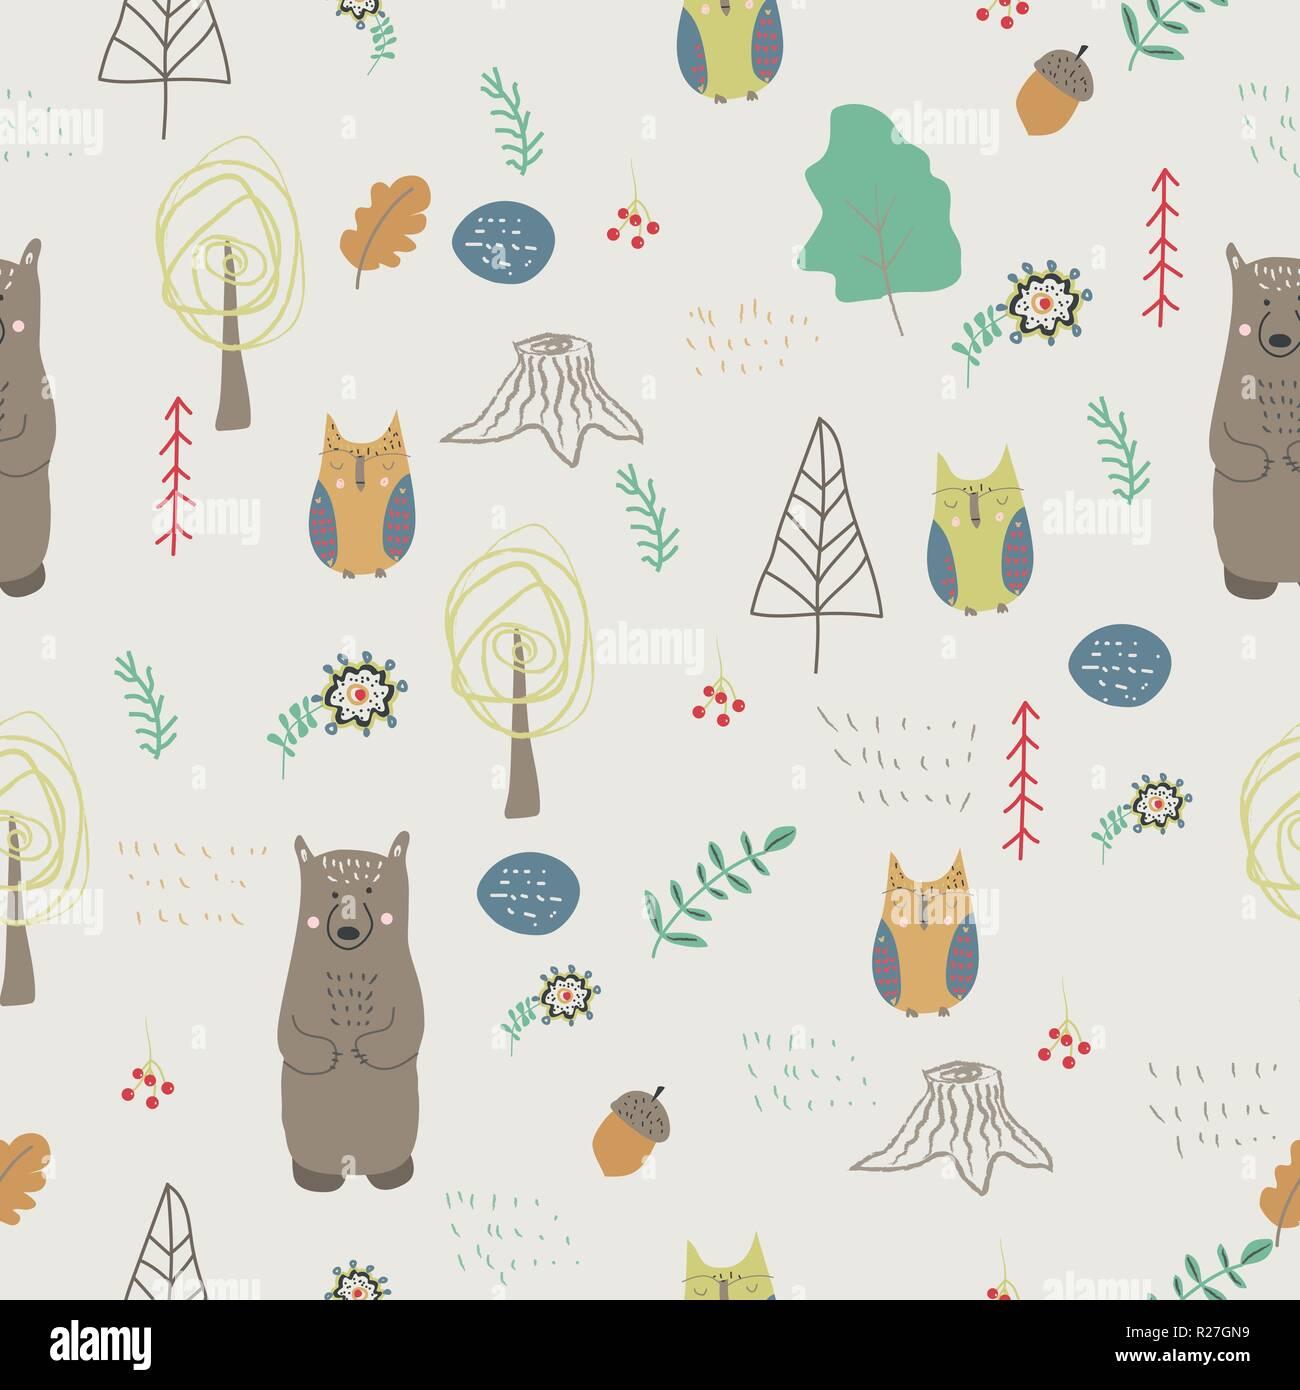 Carta Da Parati Bambini Texture.Gli Animali Del Bosco Seamless Pattern In Stile Scandinavo Bimbi